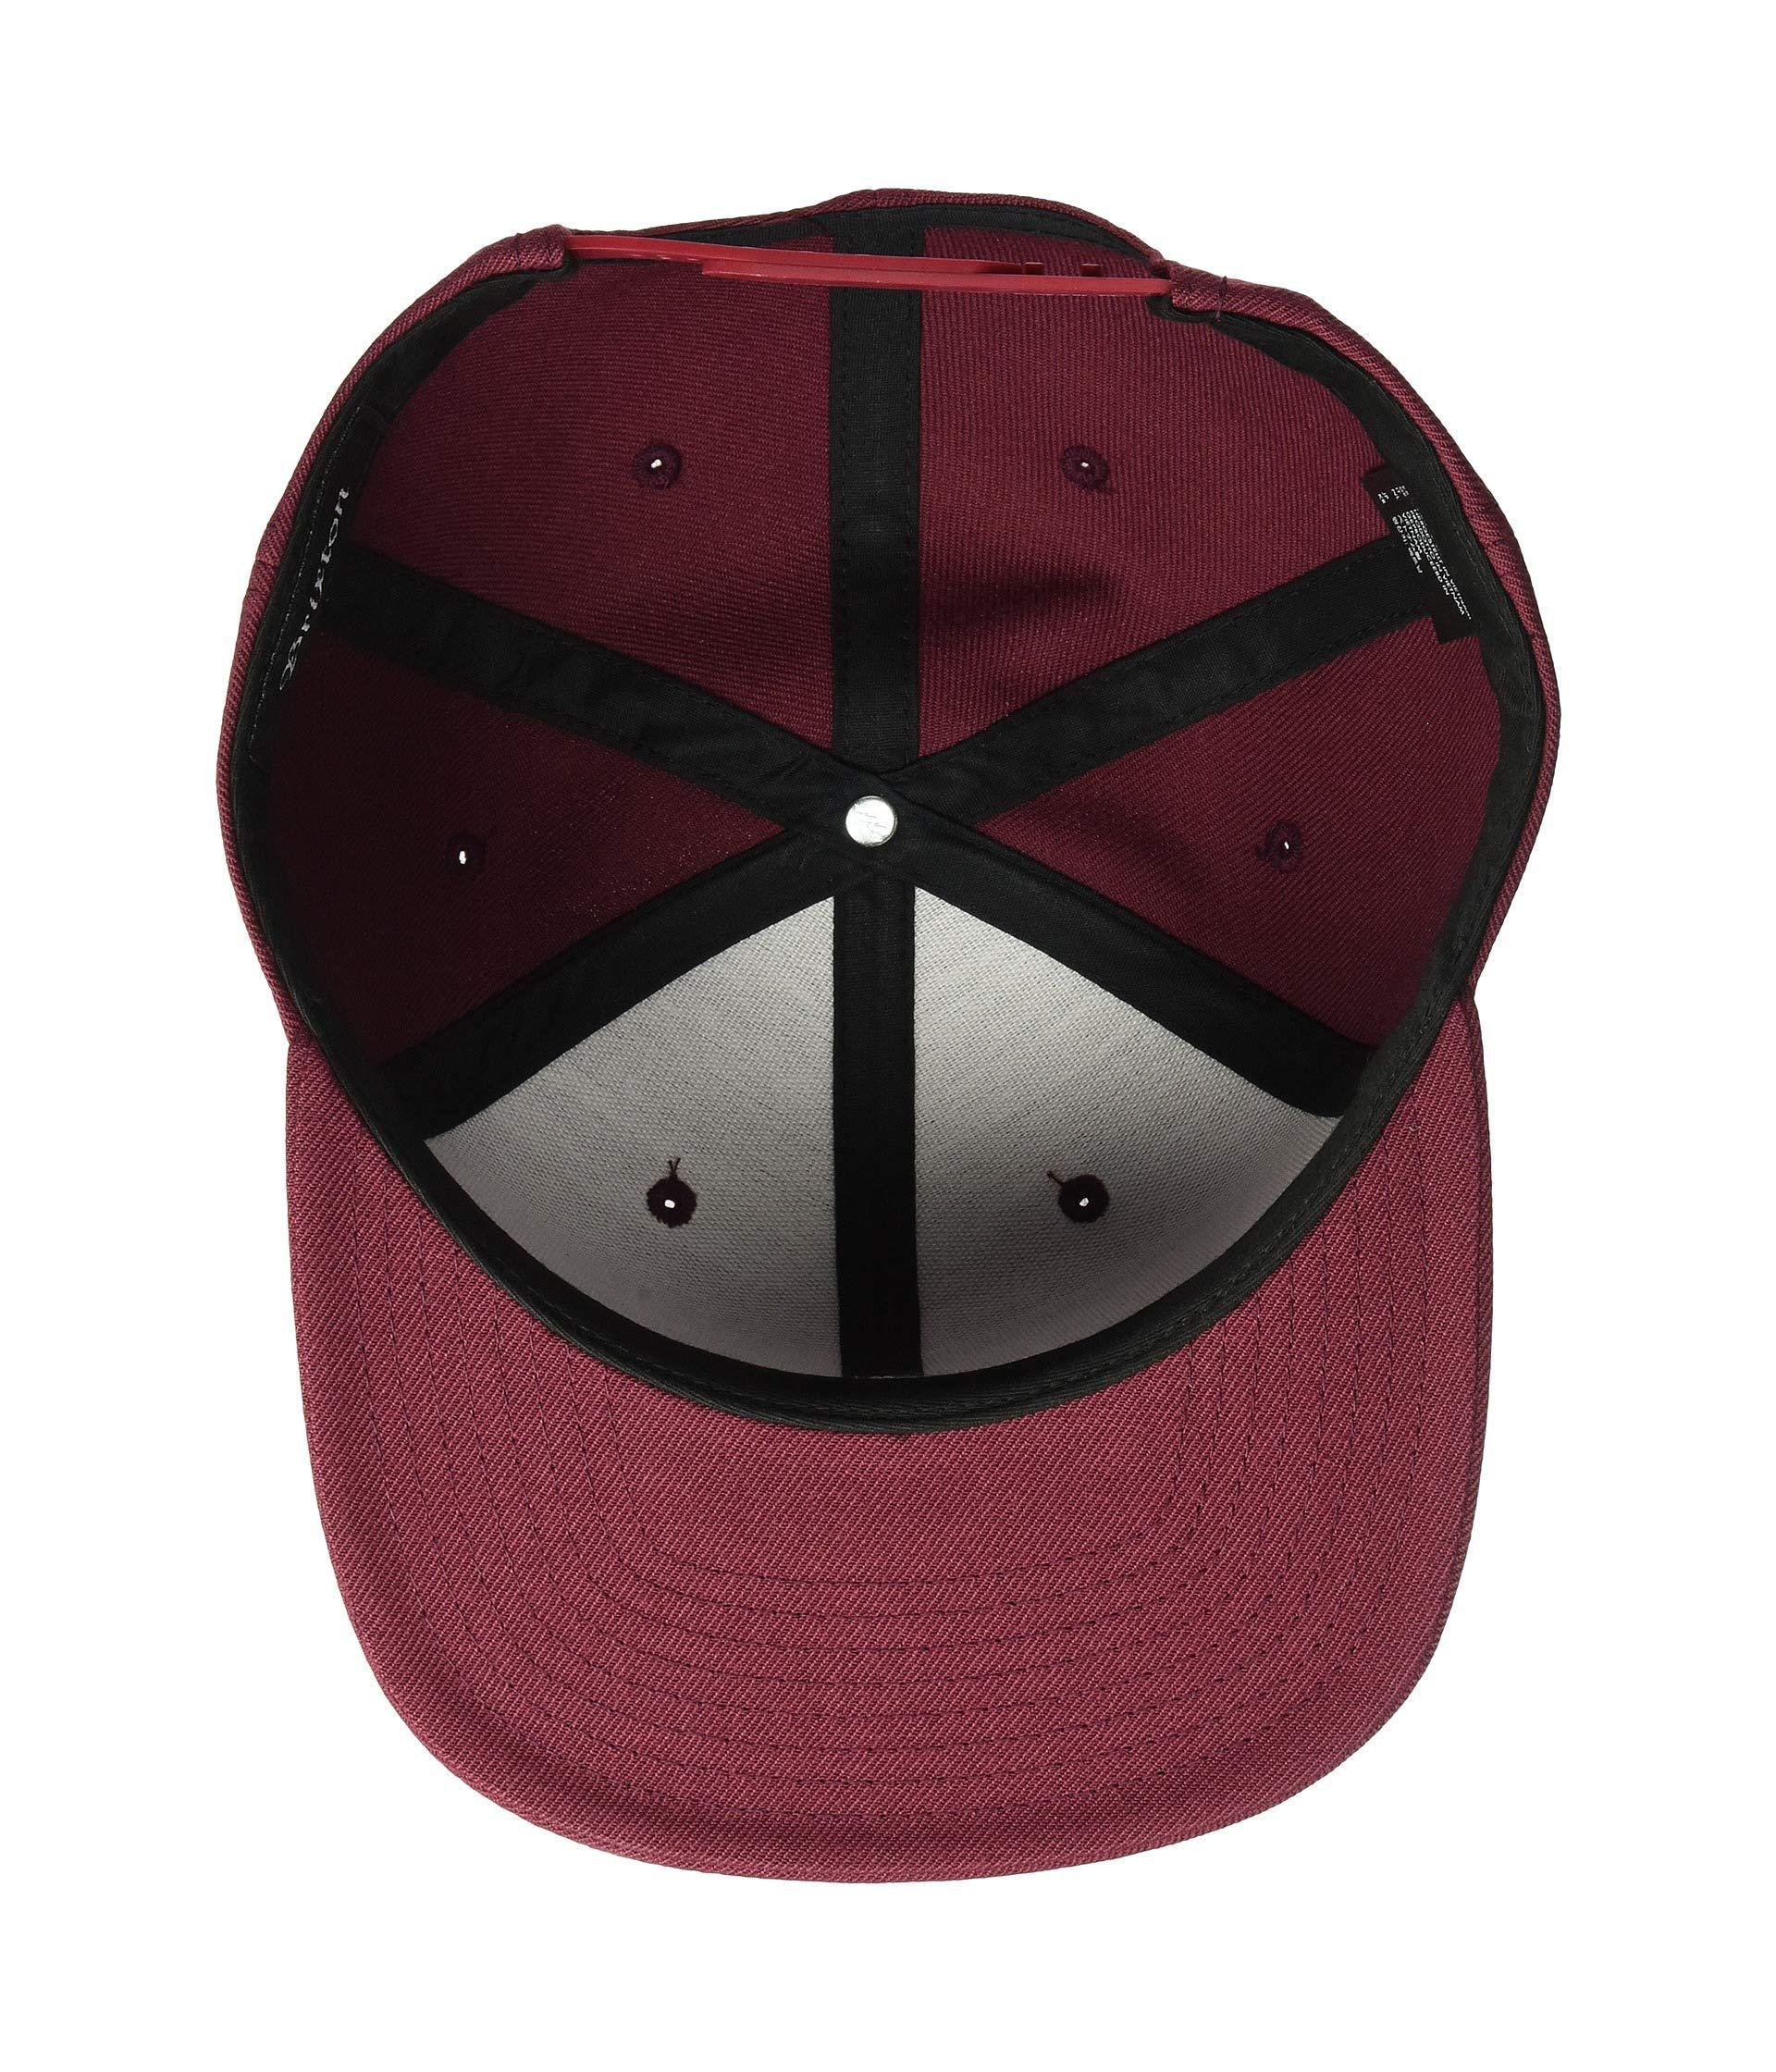 2d6ba526569 Brixton - Red Palmer Ii Mp Snapback (burgundy) Caps for Men - Lyst. View  fullscreen